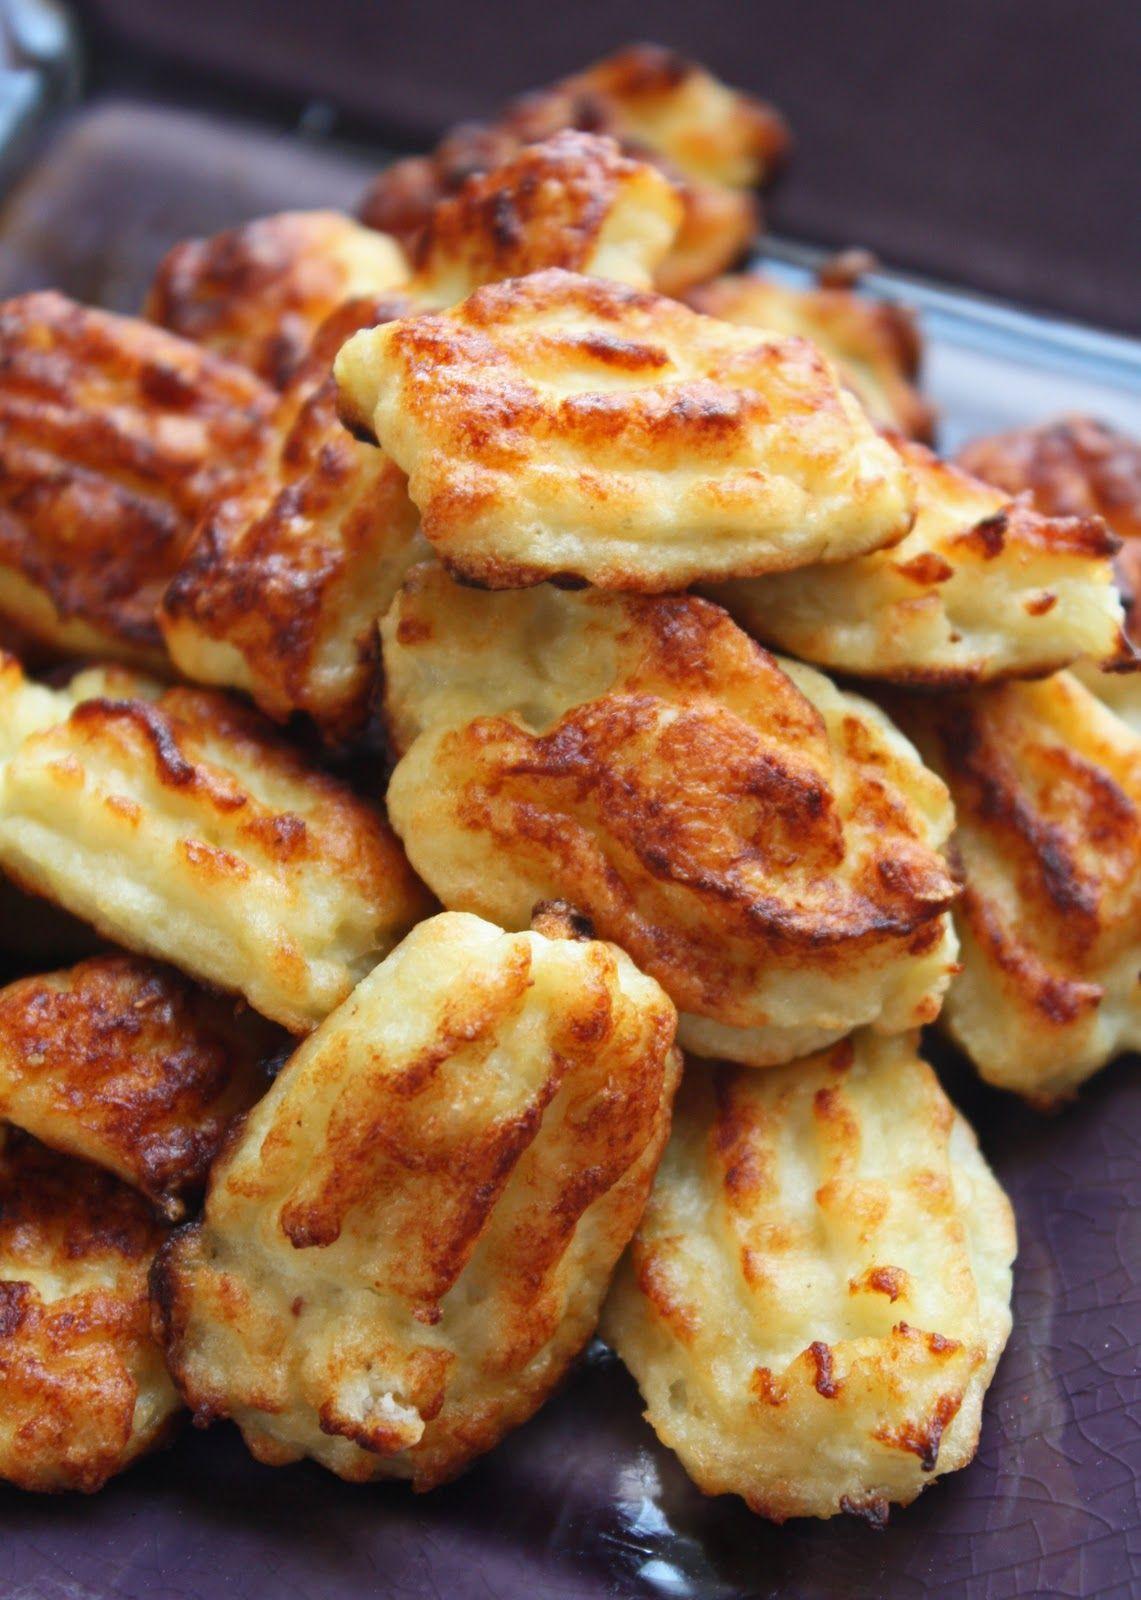 Cheesy Cauliflower Tater Tots #glutenfree Interesting idea!